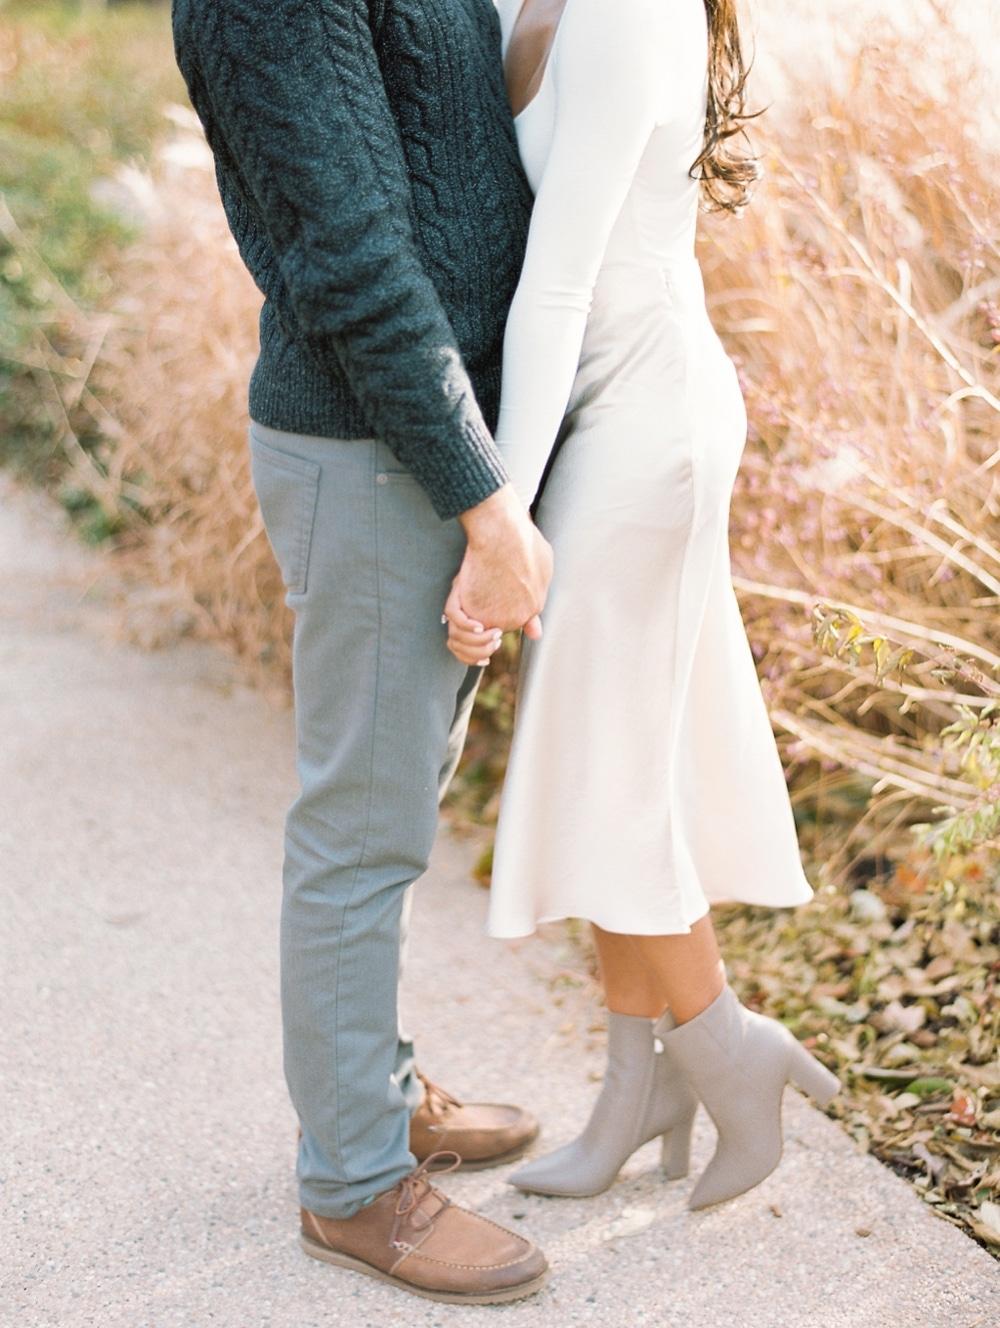 Kristin-La-Voie-Photography-morton-arboretum-chicago-wedding-photographer-17